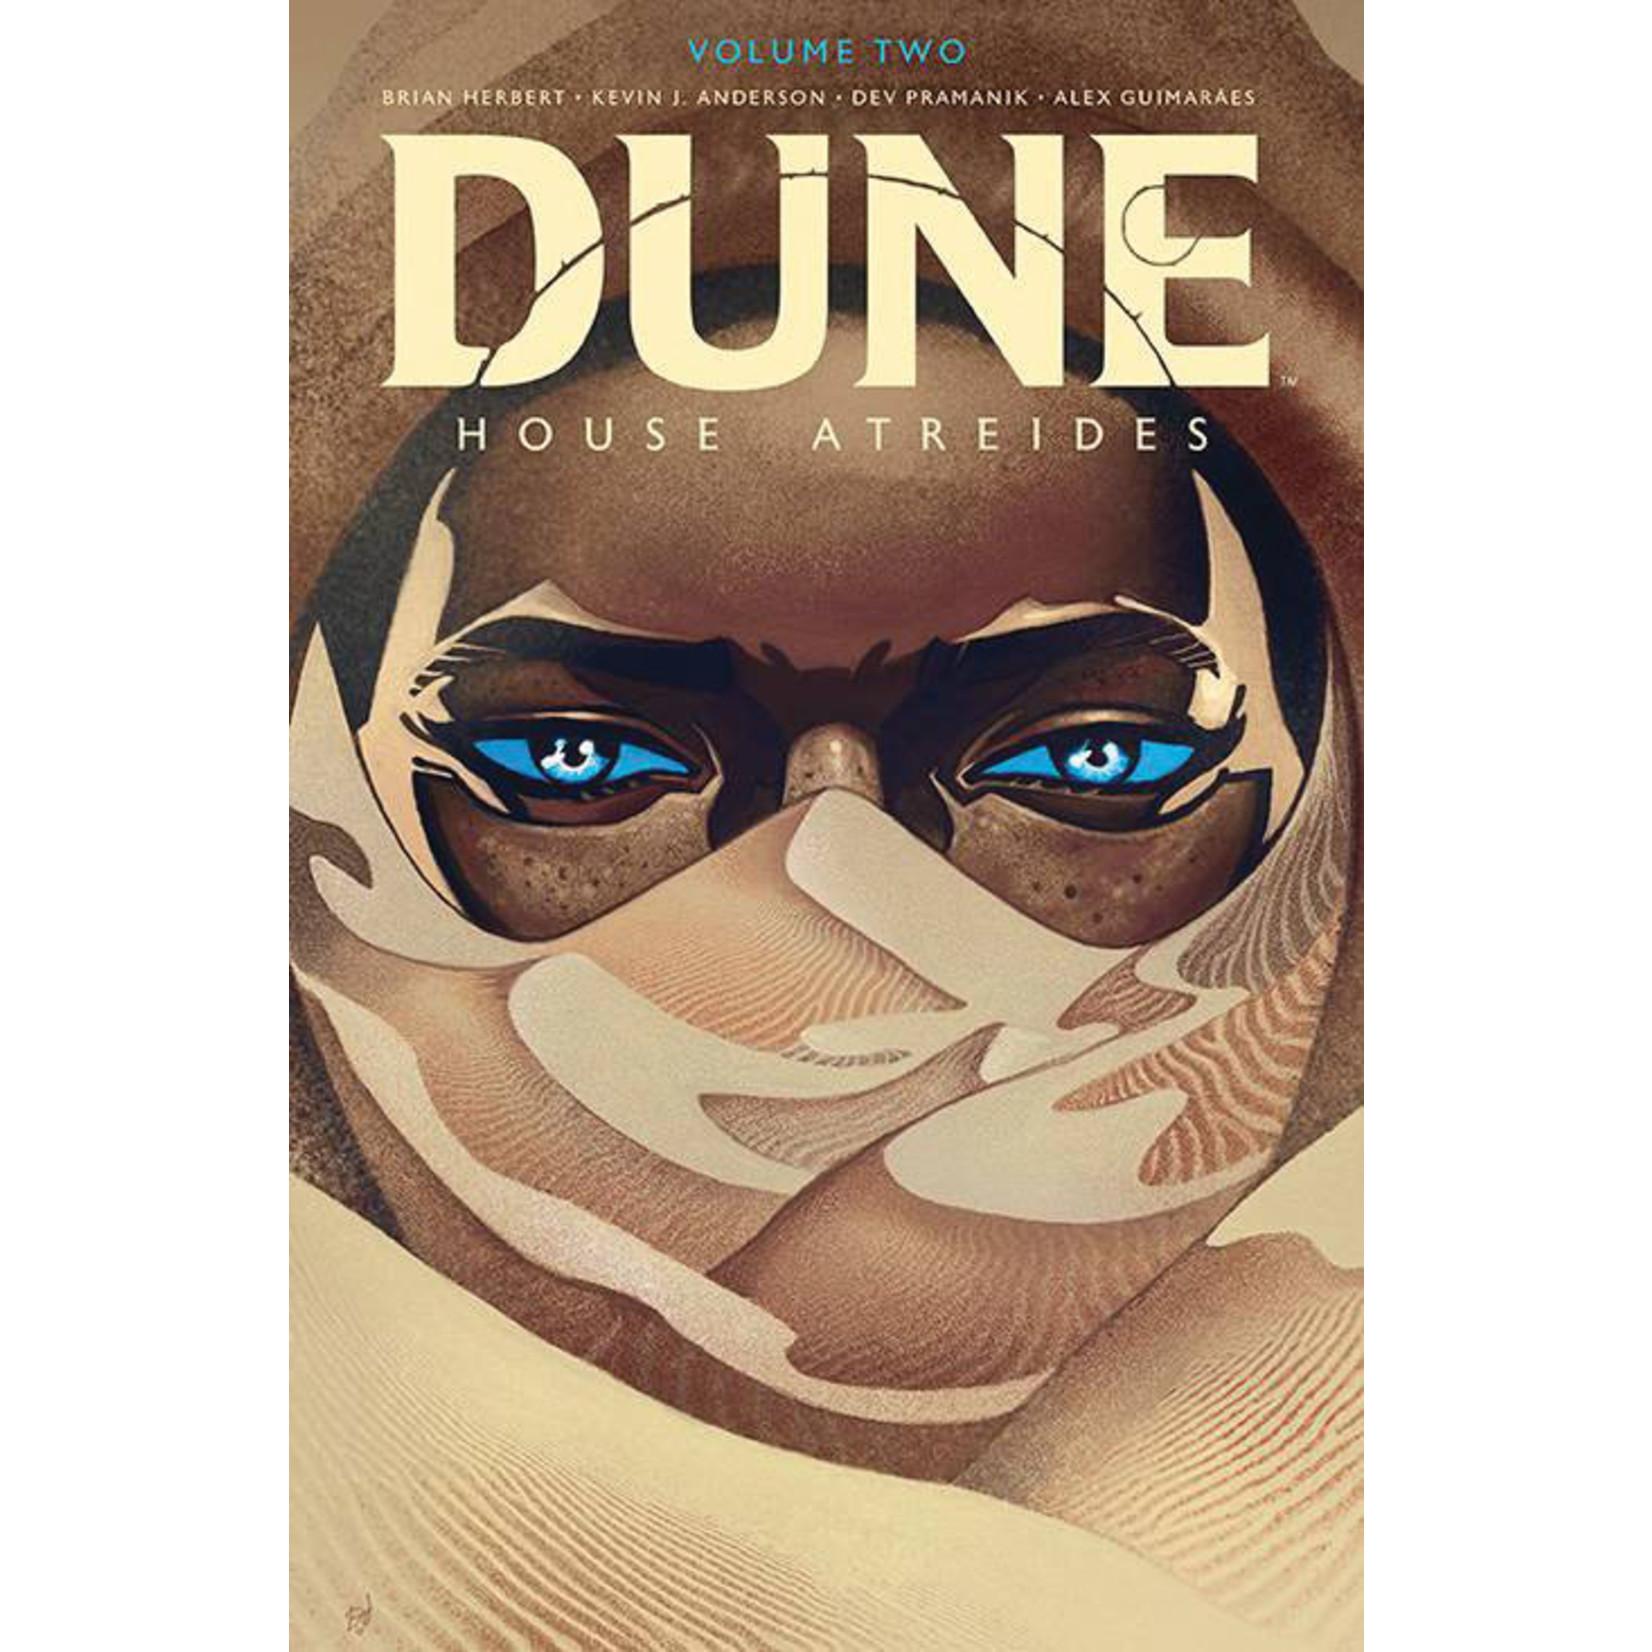 Pre-Order Dune House Atreides HC Vol 02 (TPB)/Graphic Novel